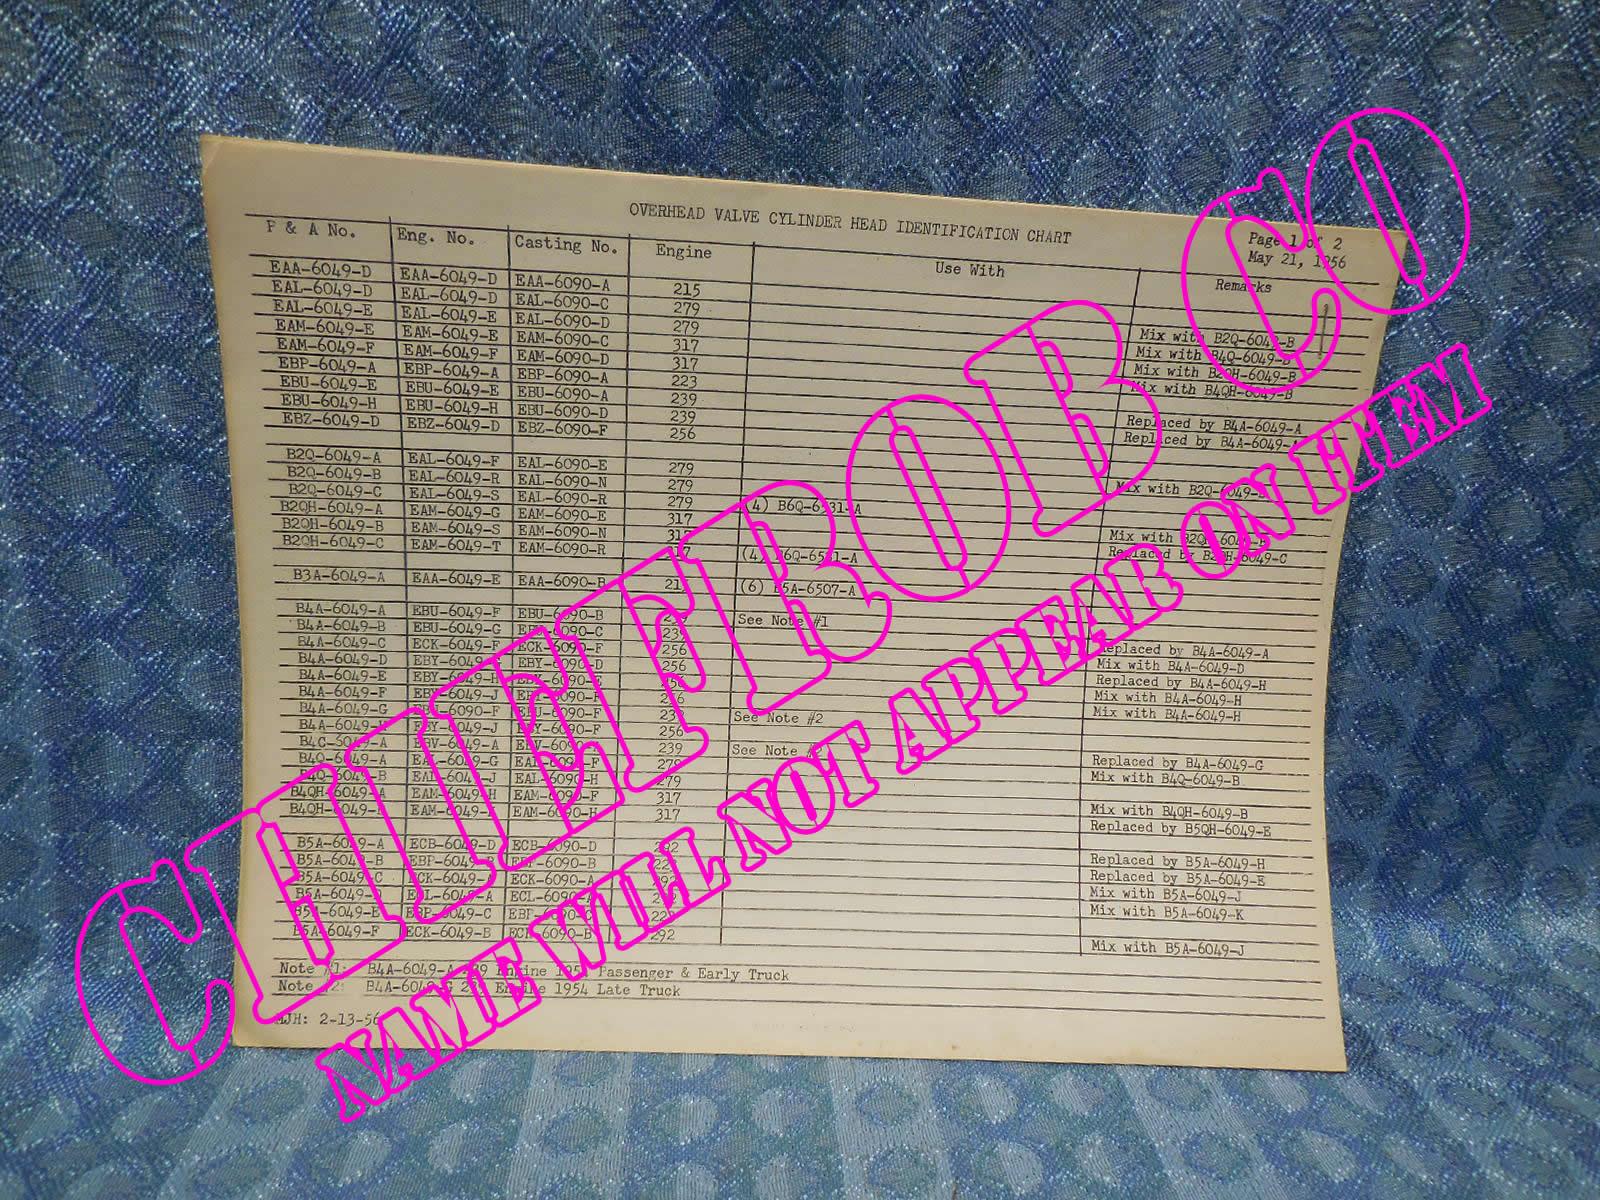 1954-1956 Ford Original Dealer Overhead Valve Cylinder Head & Block ID  Chart 55 - NOS Texas Parts, LLC - Antique Auto Parts